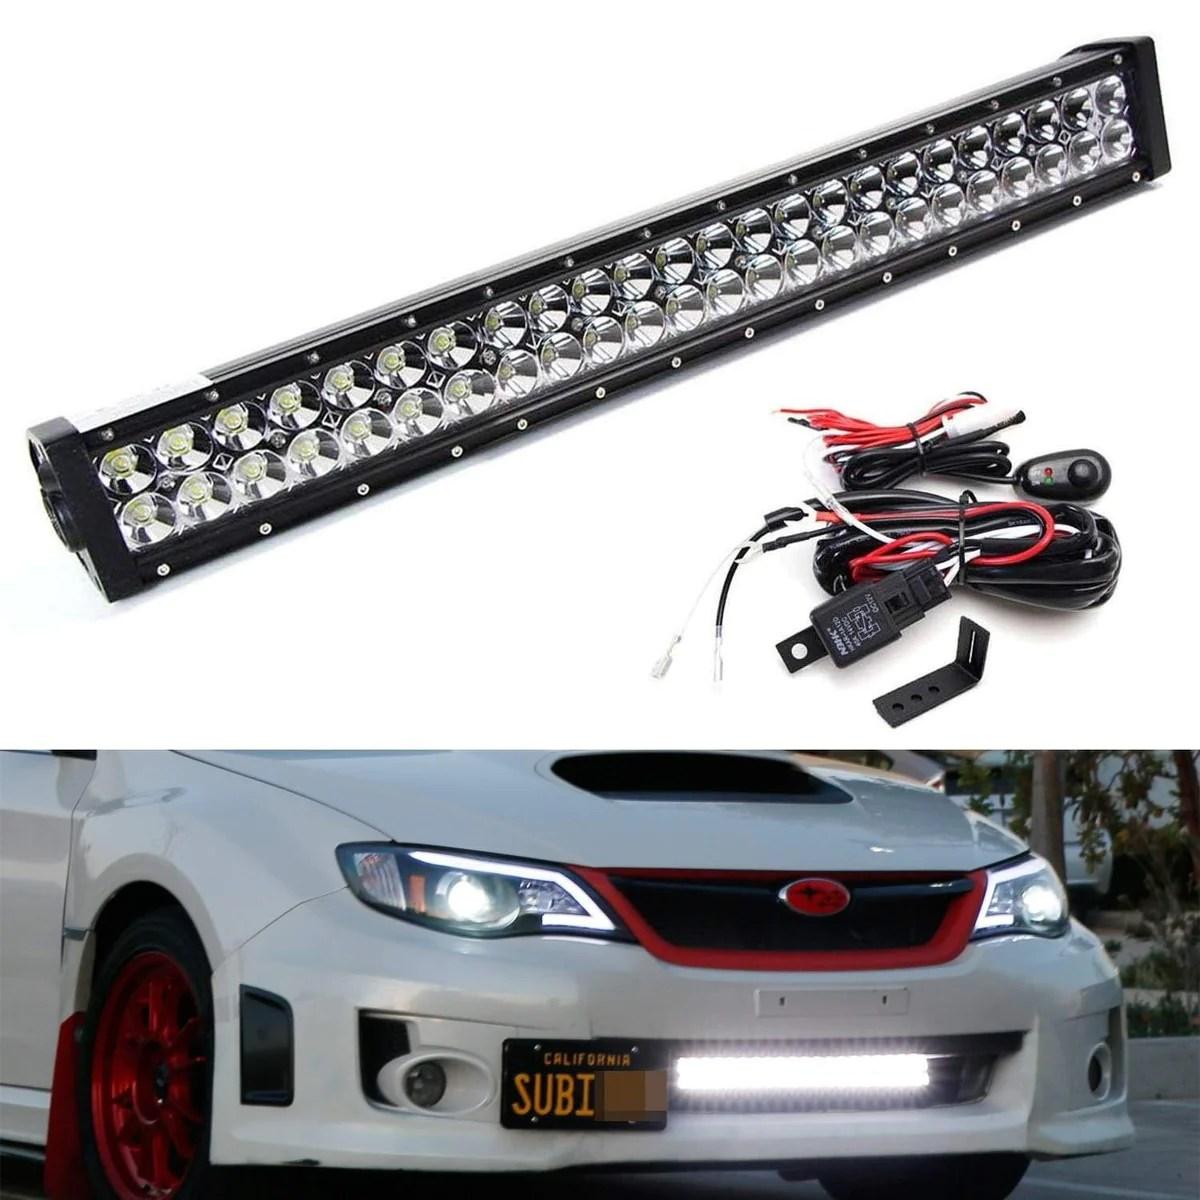 11 14 subaru impreza wrx sti lower bumper led light bar kit ijdmtoy com [ 1200 x 1200 Pixel ]